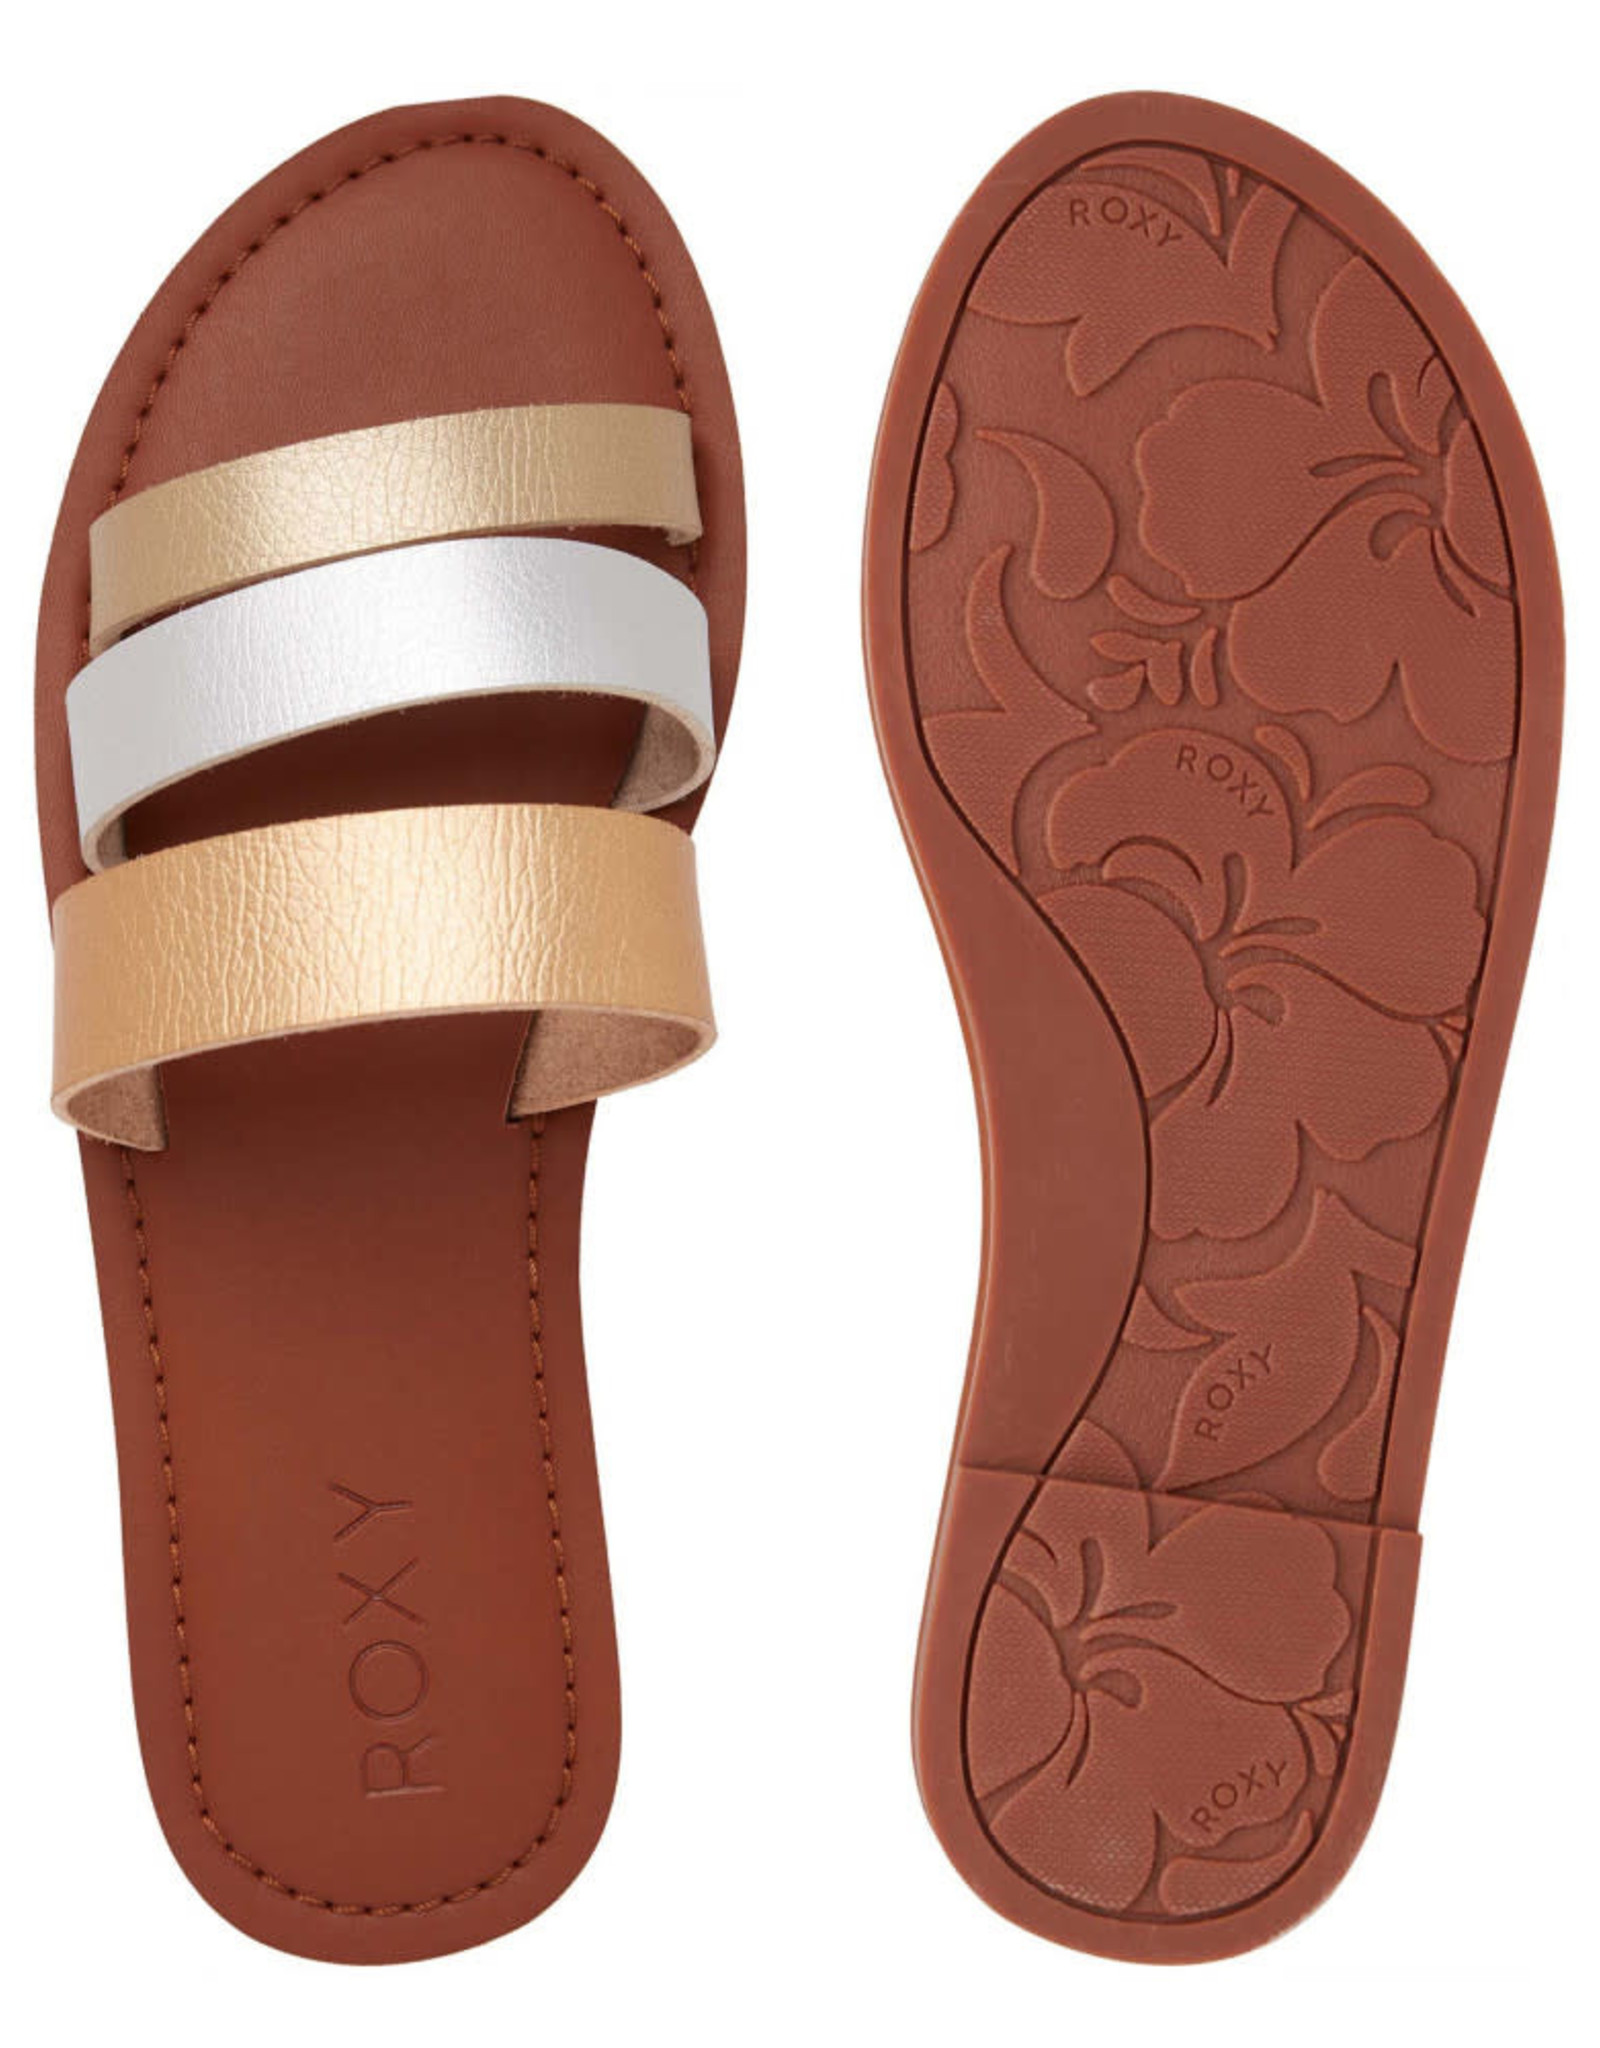 ROXY Wyld Rose Sandals